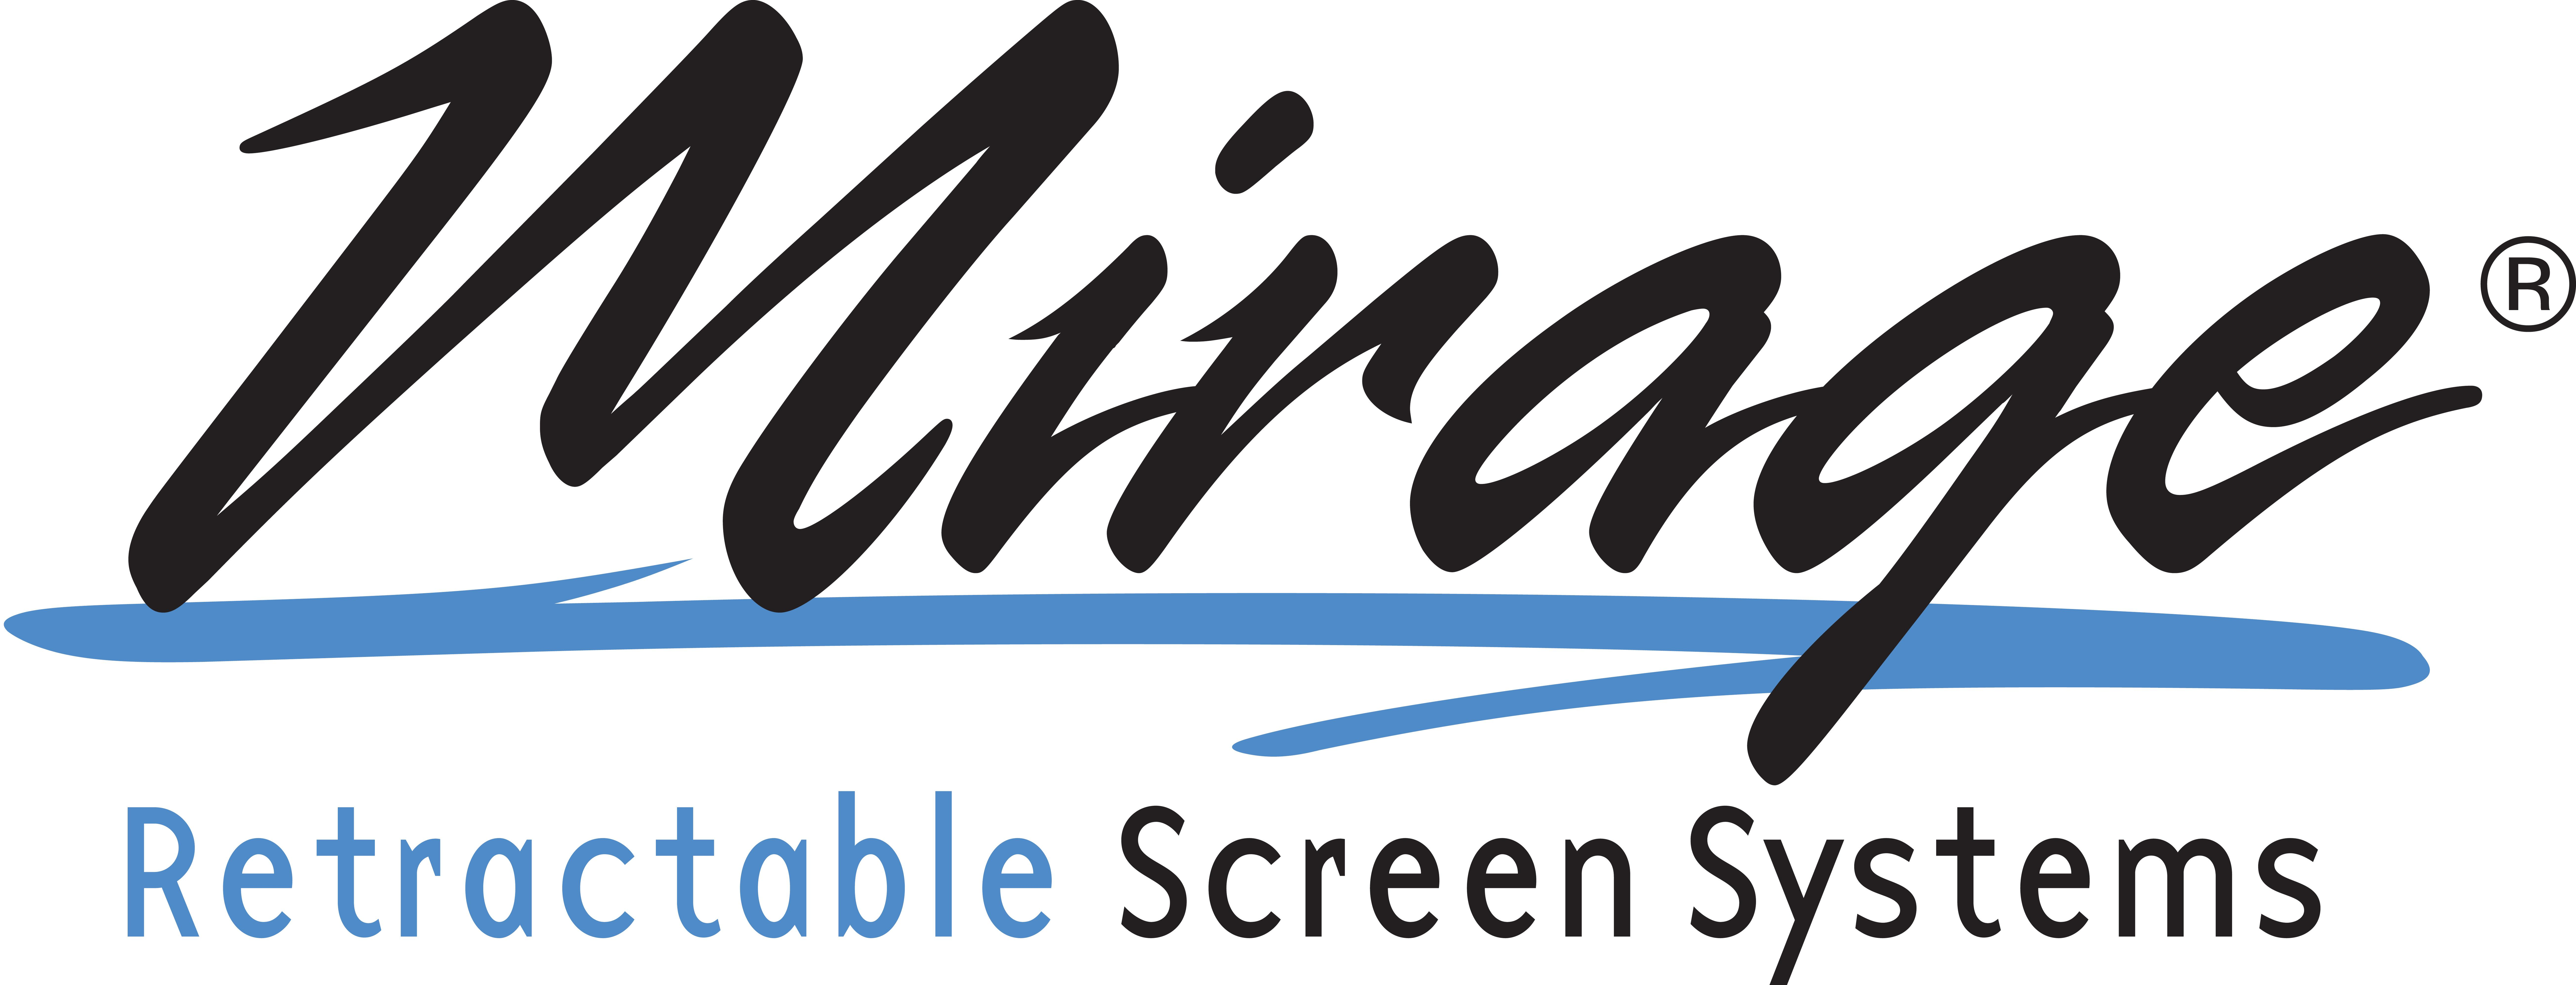 Mirage Retractable Screens